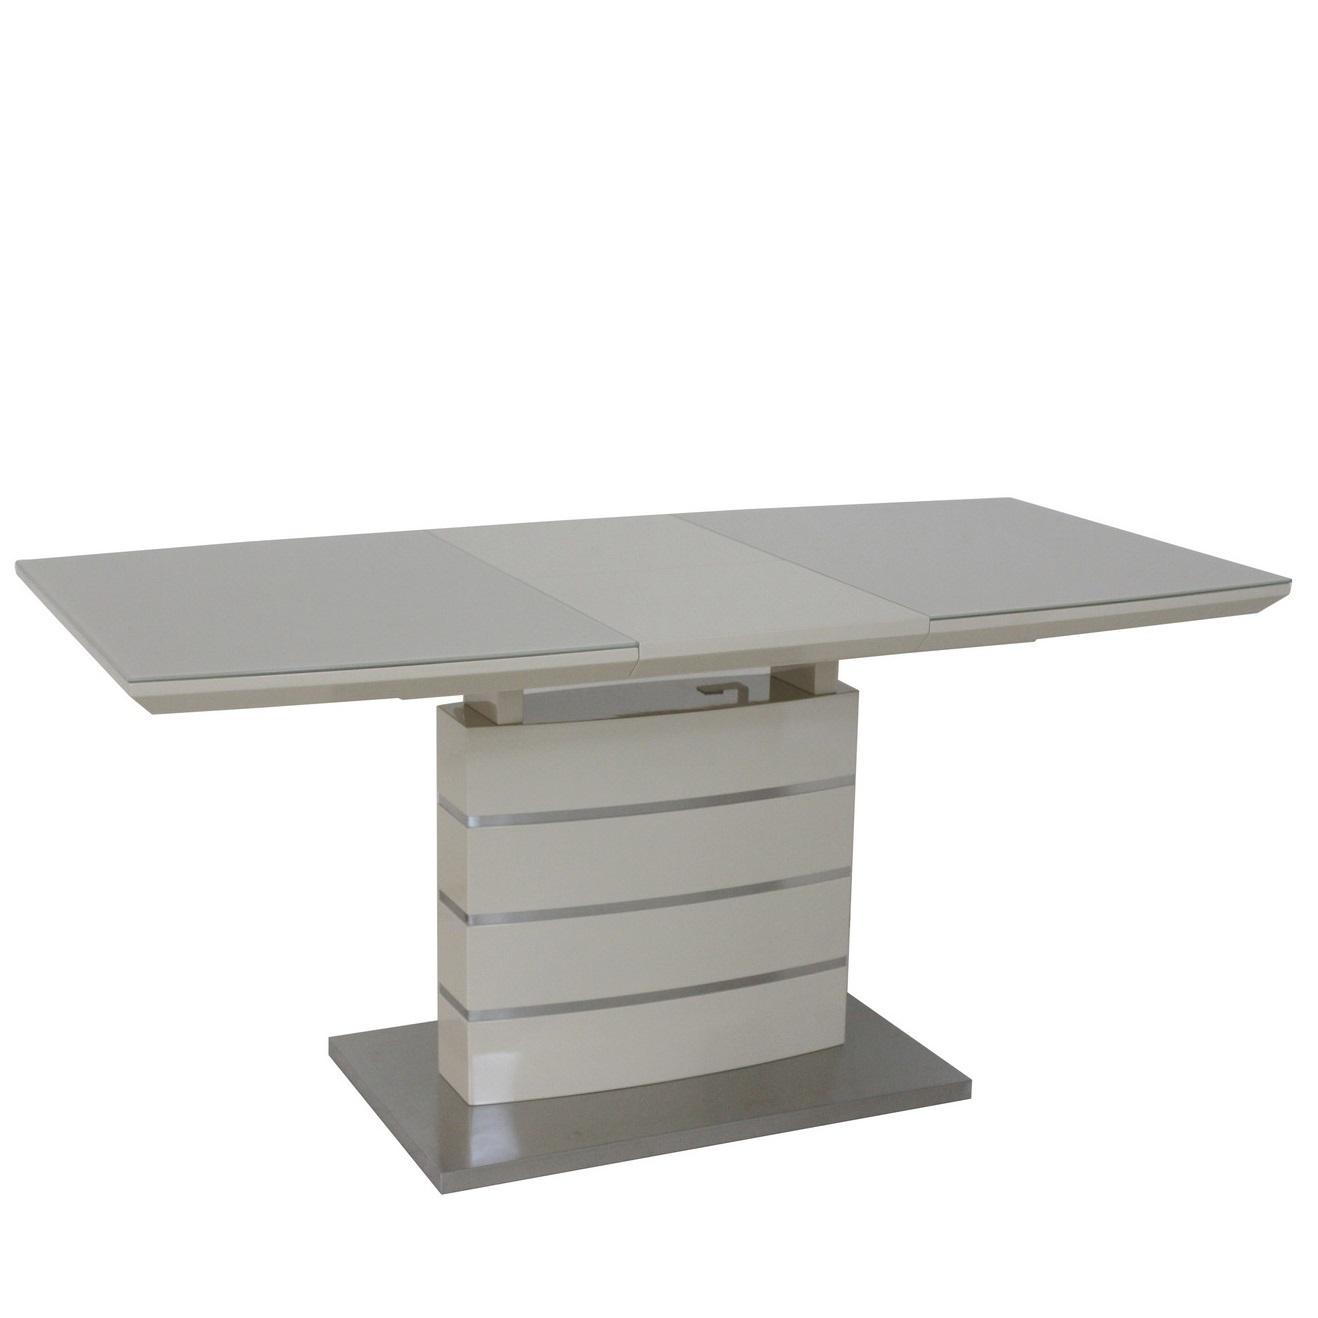 Стол обеденный AVANTI MARS (140) BEIGE (бежевый)